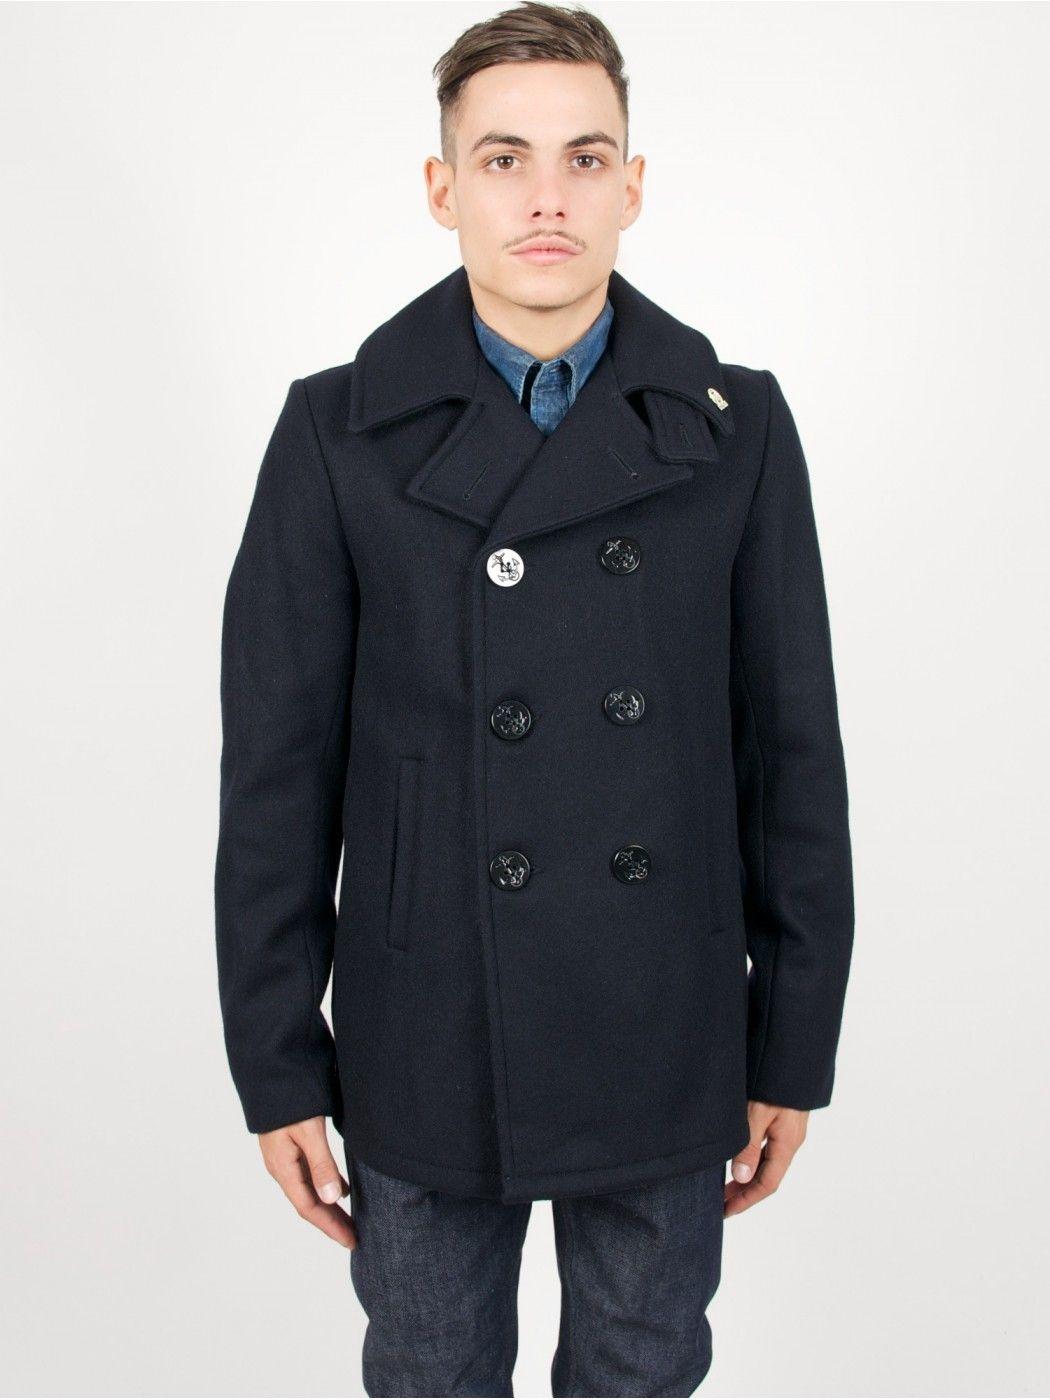 Fidelity Short Peacoat Jacket Wool Dark Navy | Menswear Form and